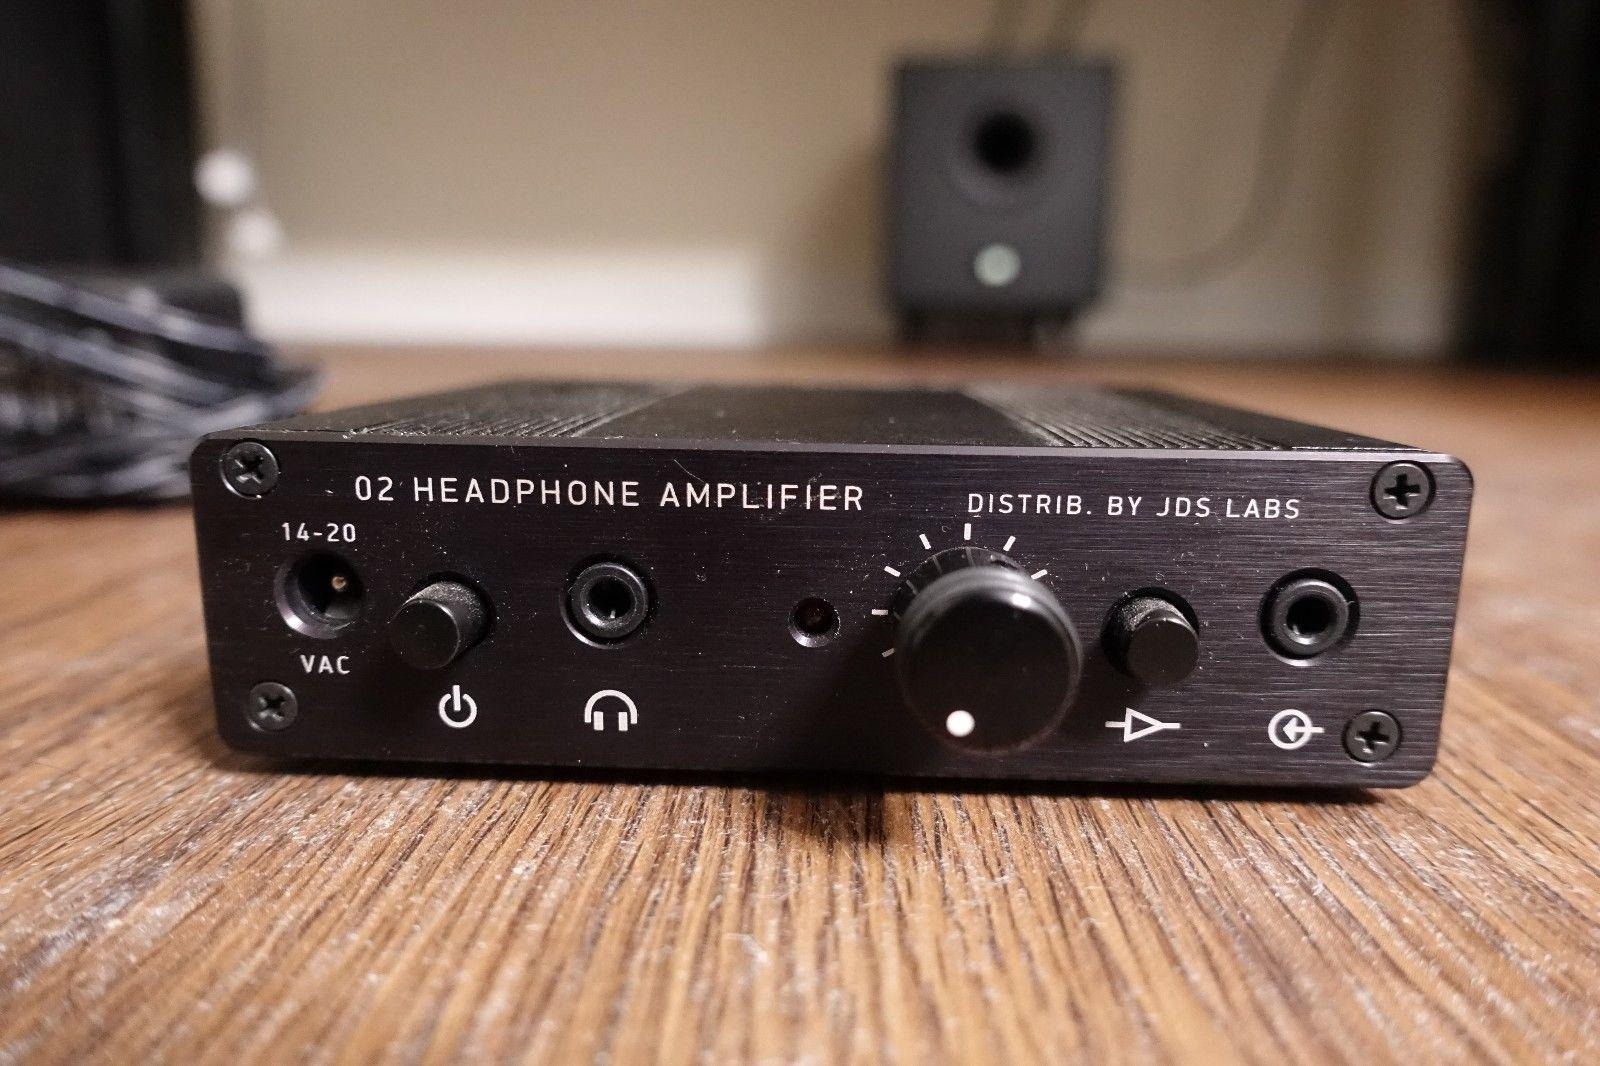 OBJECTIVE 2 Headphone Amplifier + ODAC Combo (Black)